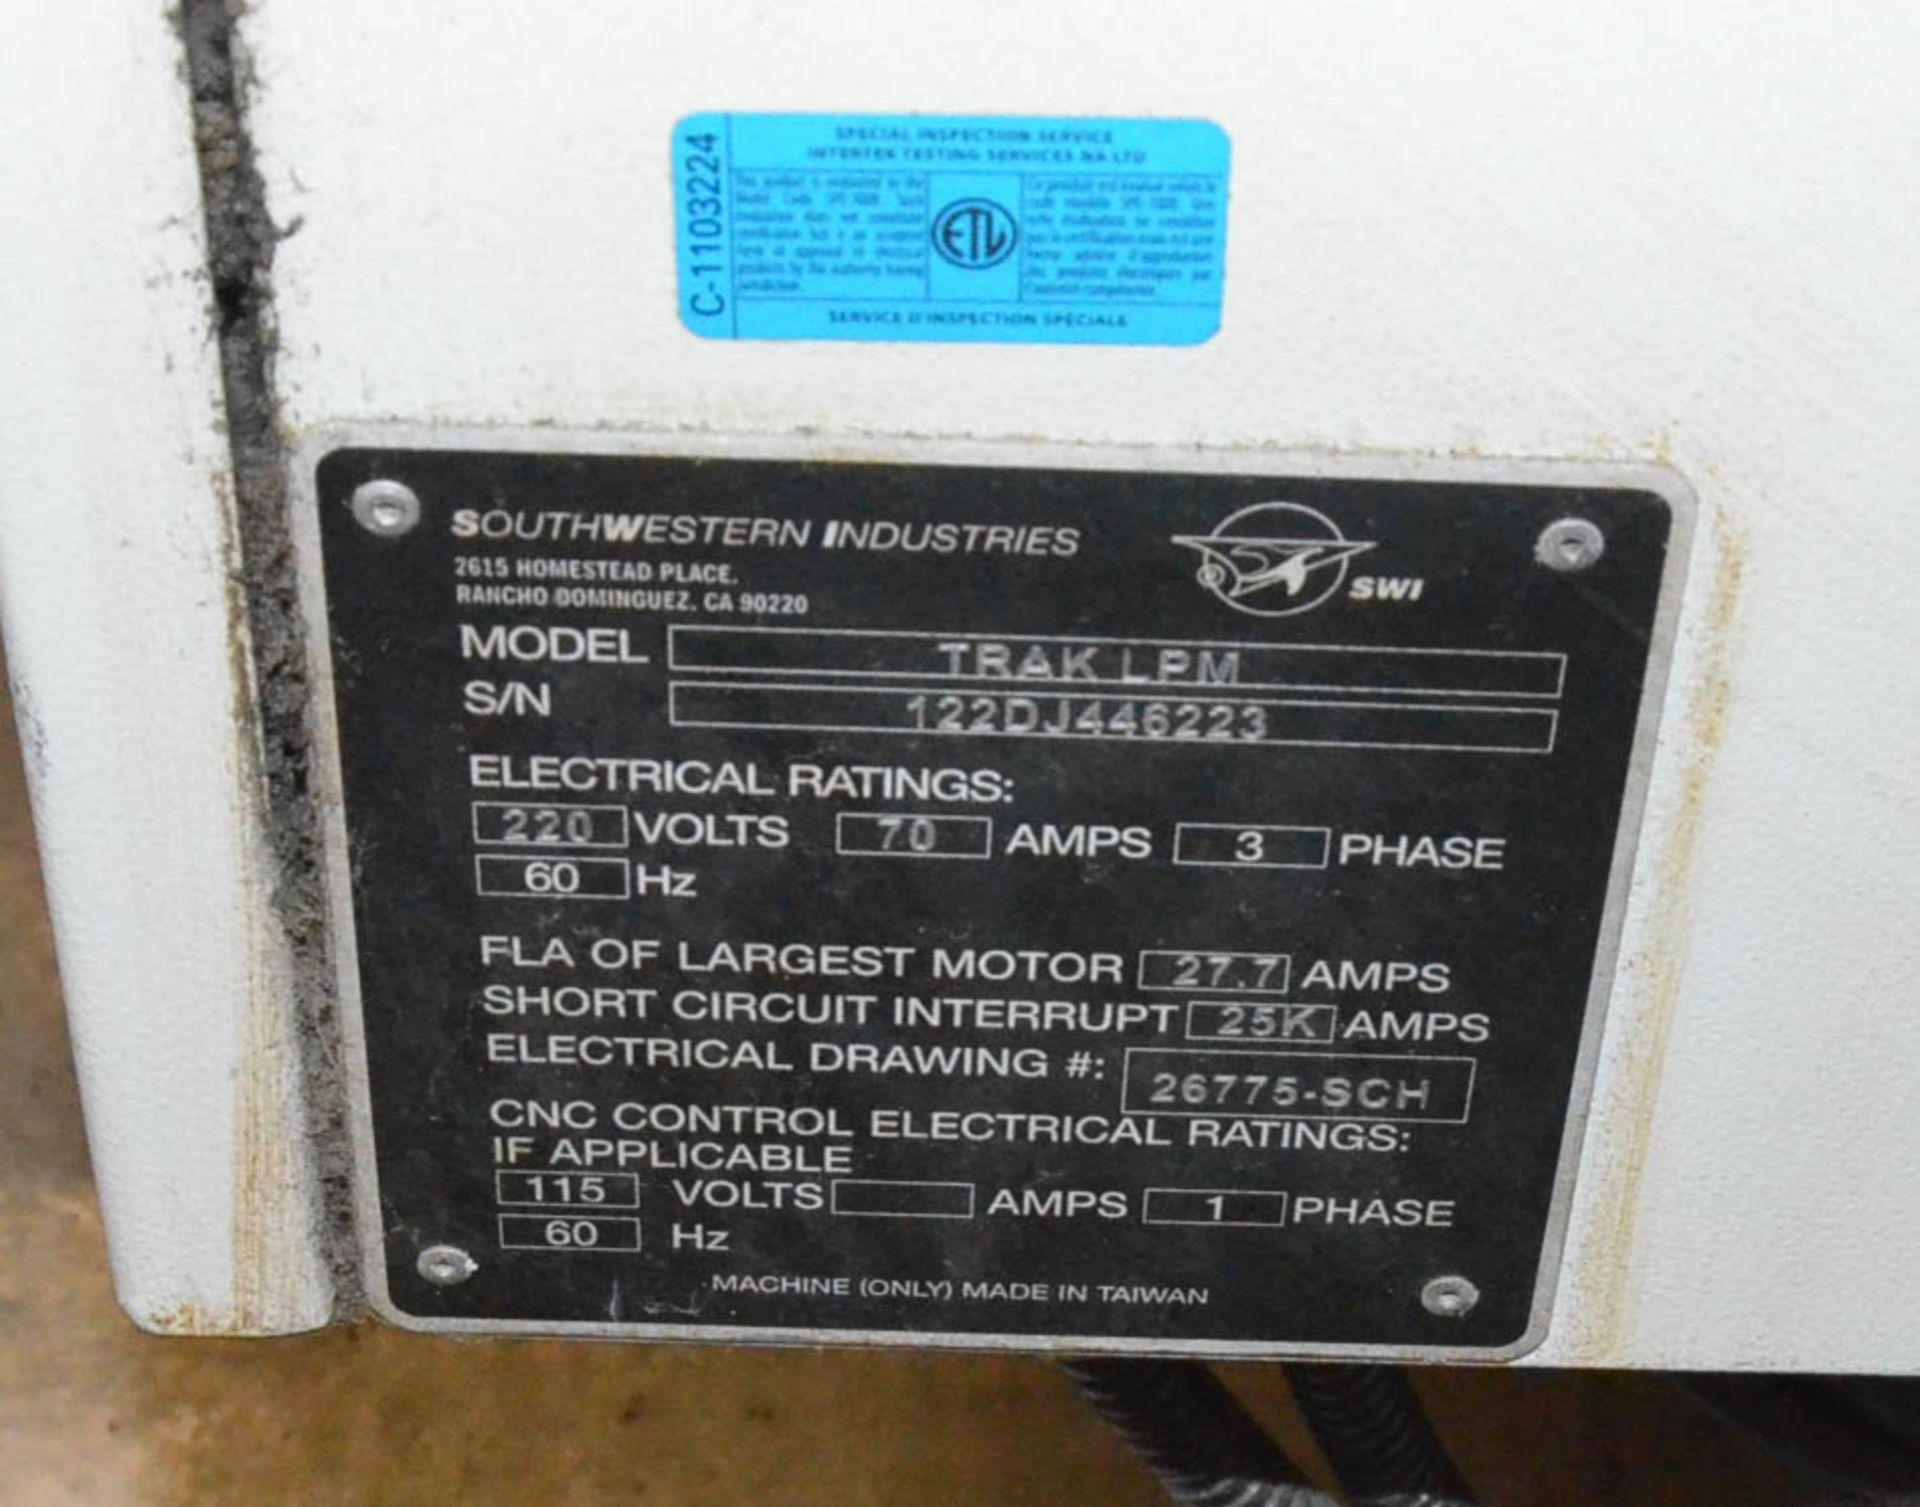 SWI (2012) TRAK LPM 4-AXIS READY CNC VERTICAL MACHINING CENTER WITH PROTO TRAK PMX CNC CONTROL, 19. - Image 4 of 10